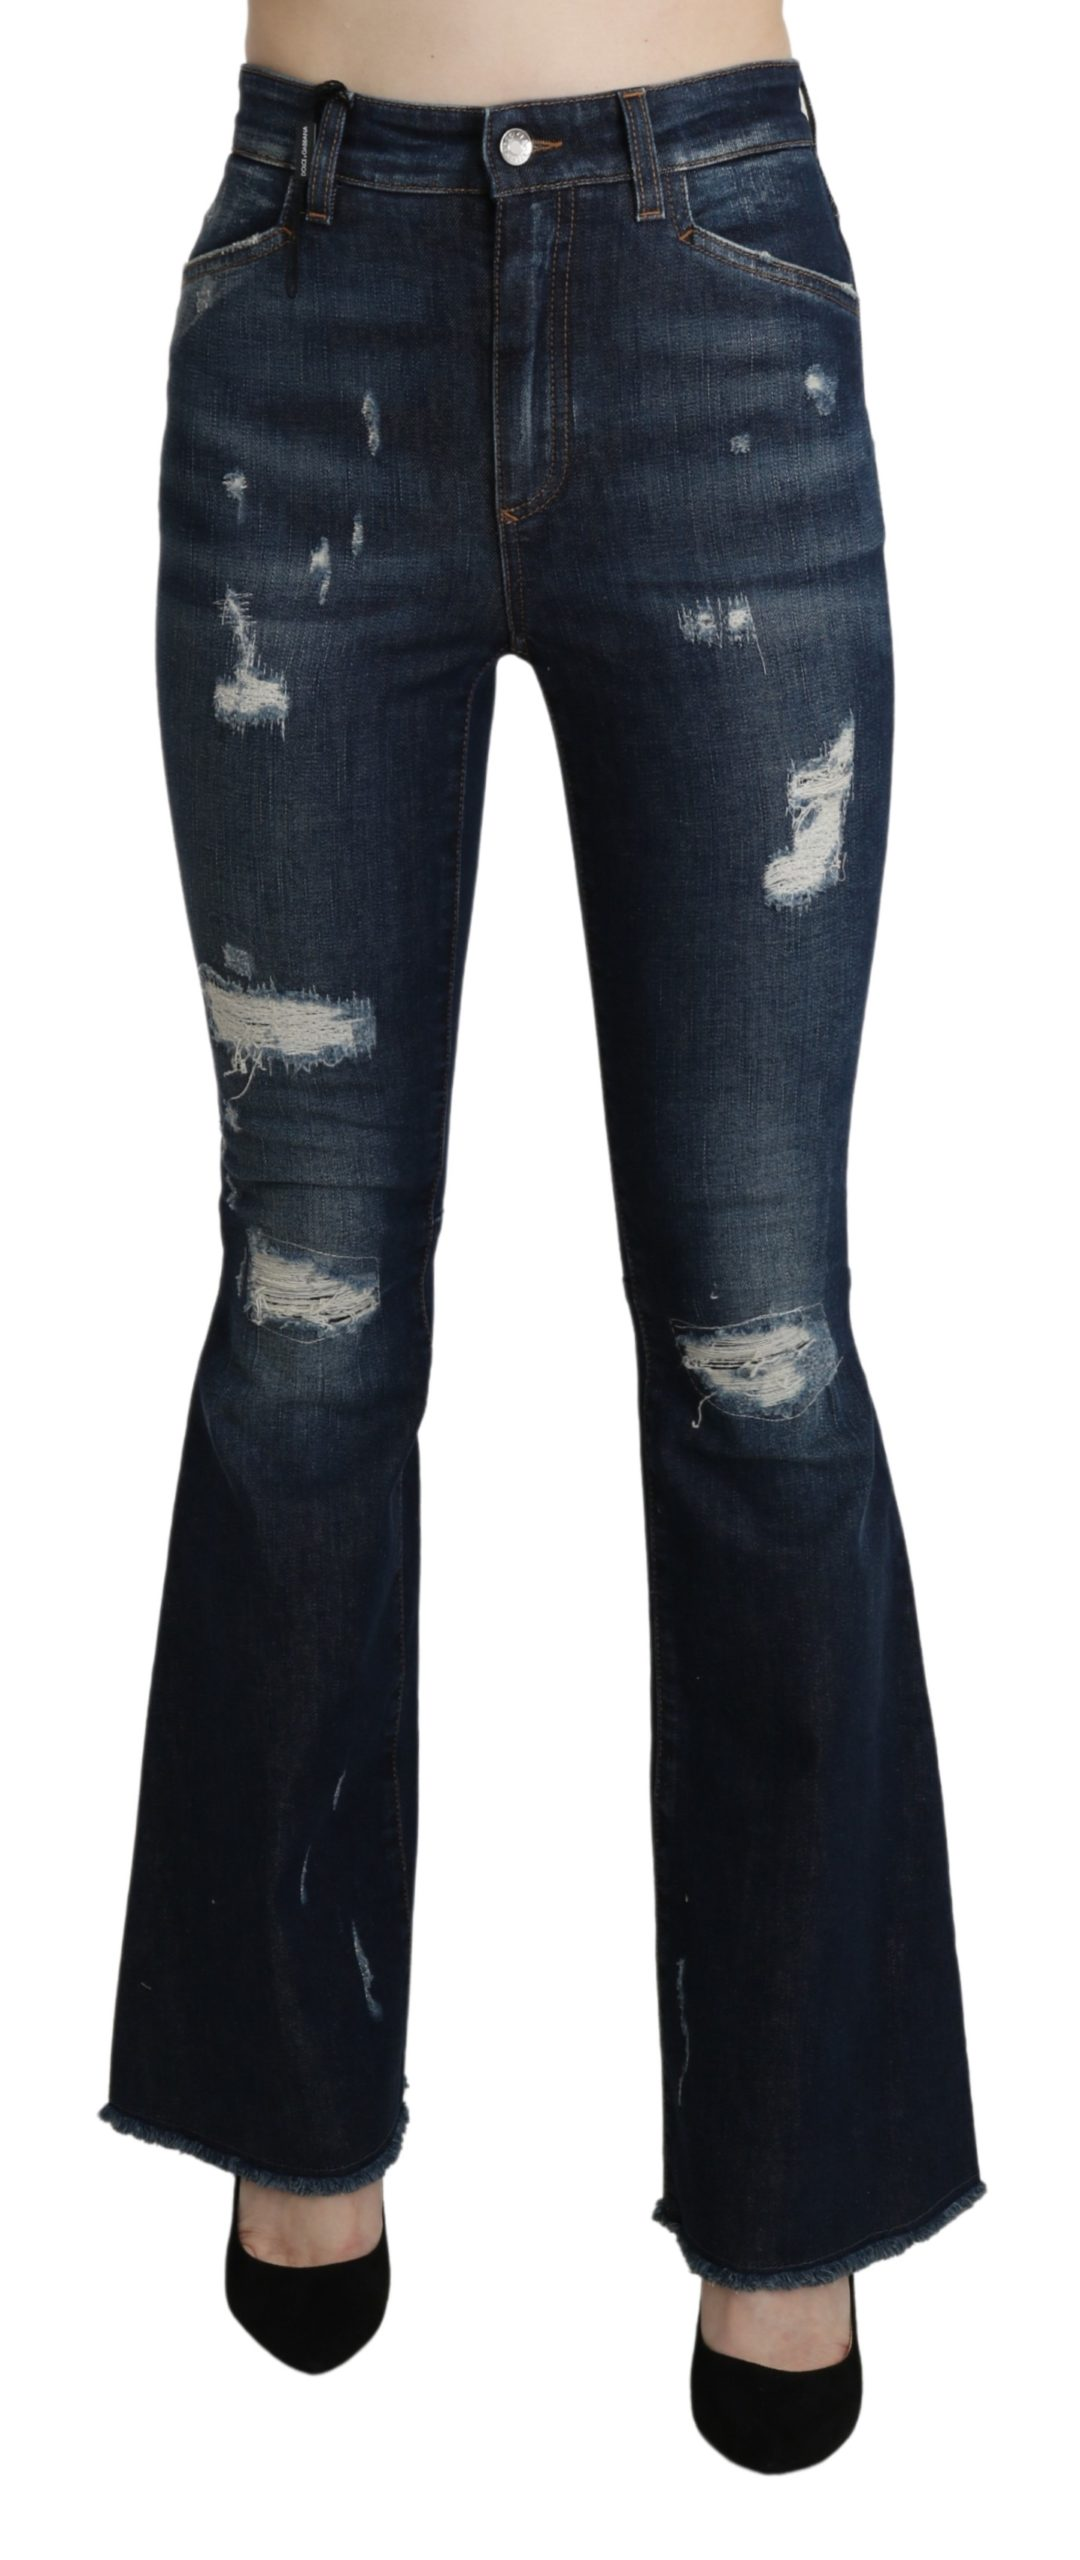 Blue Denim Cotton Stretch Flared Jeans - IT38|XS